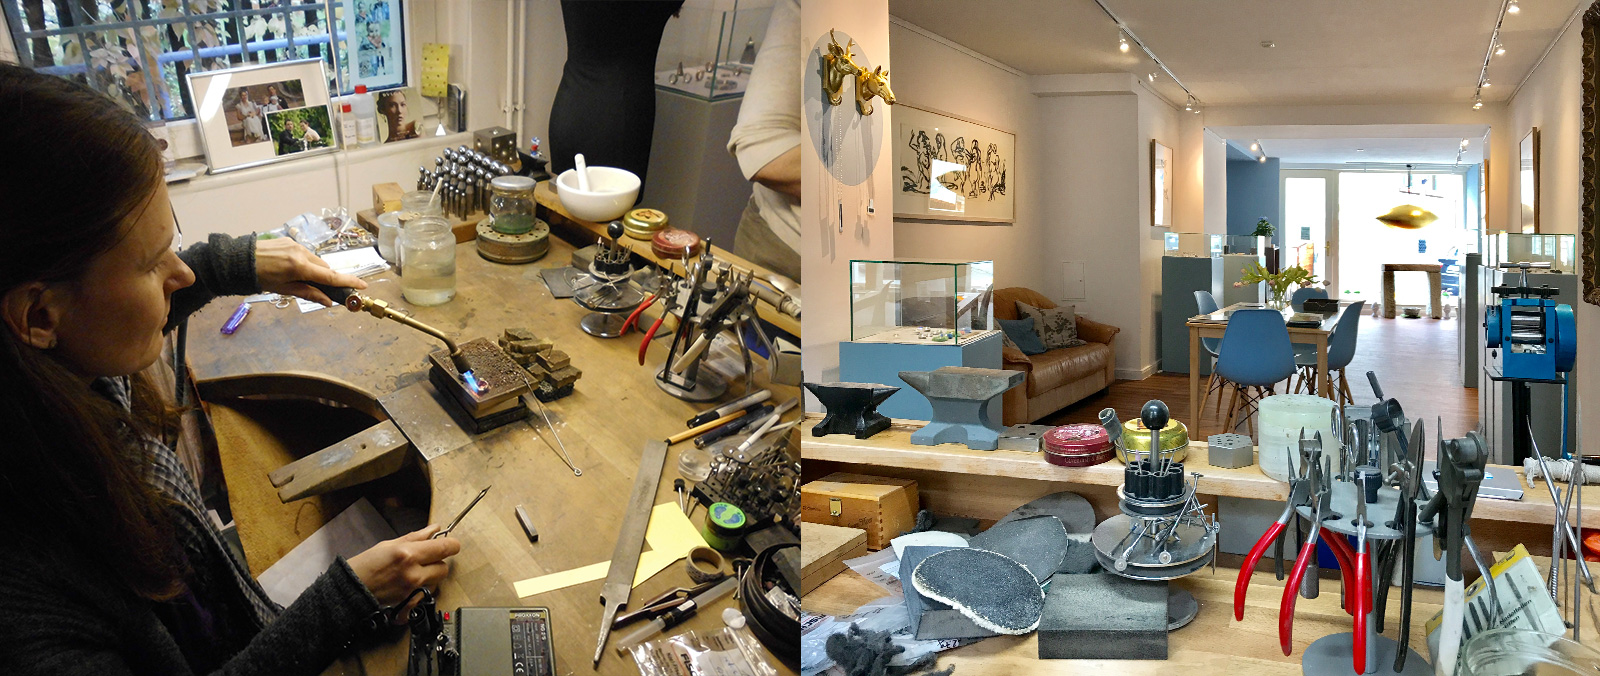 Einblick in Nane Adams Werkstatt